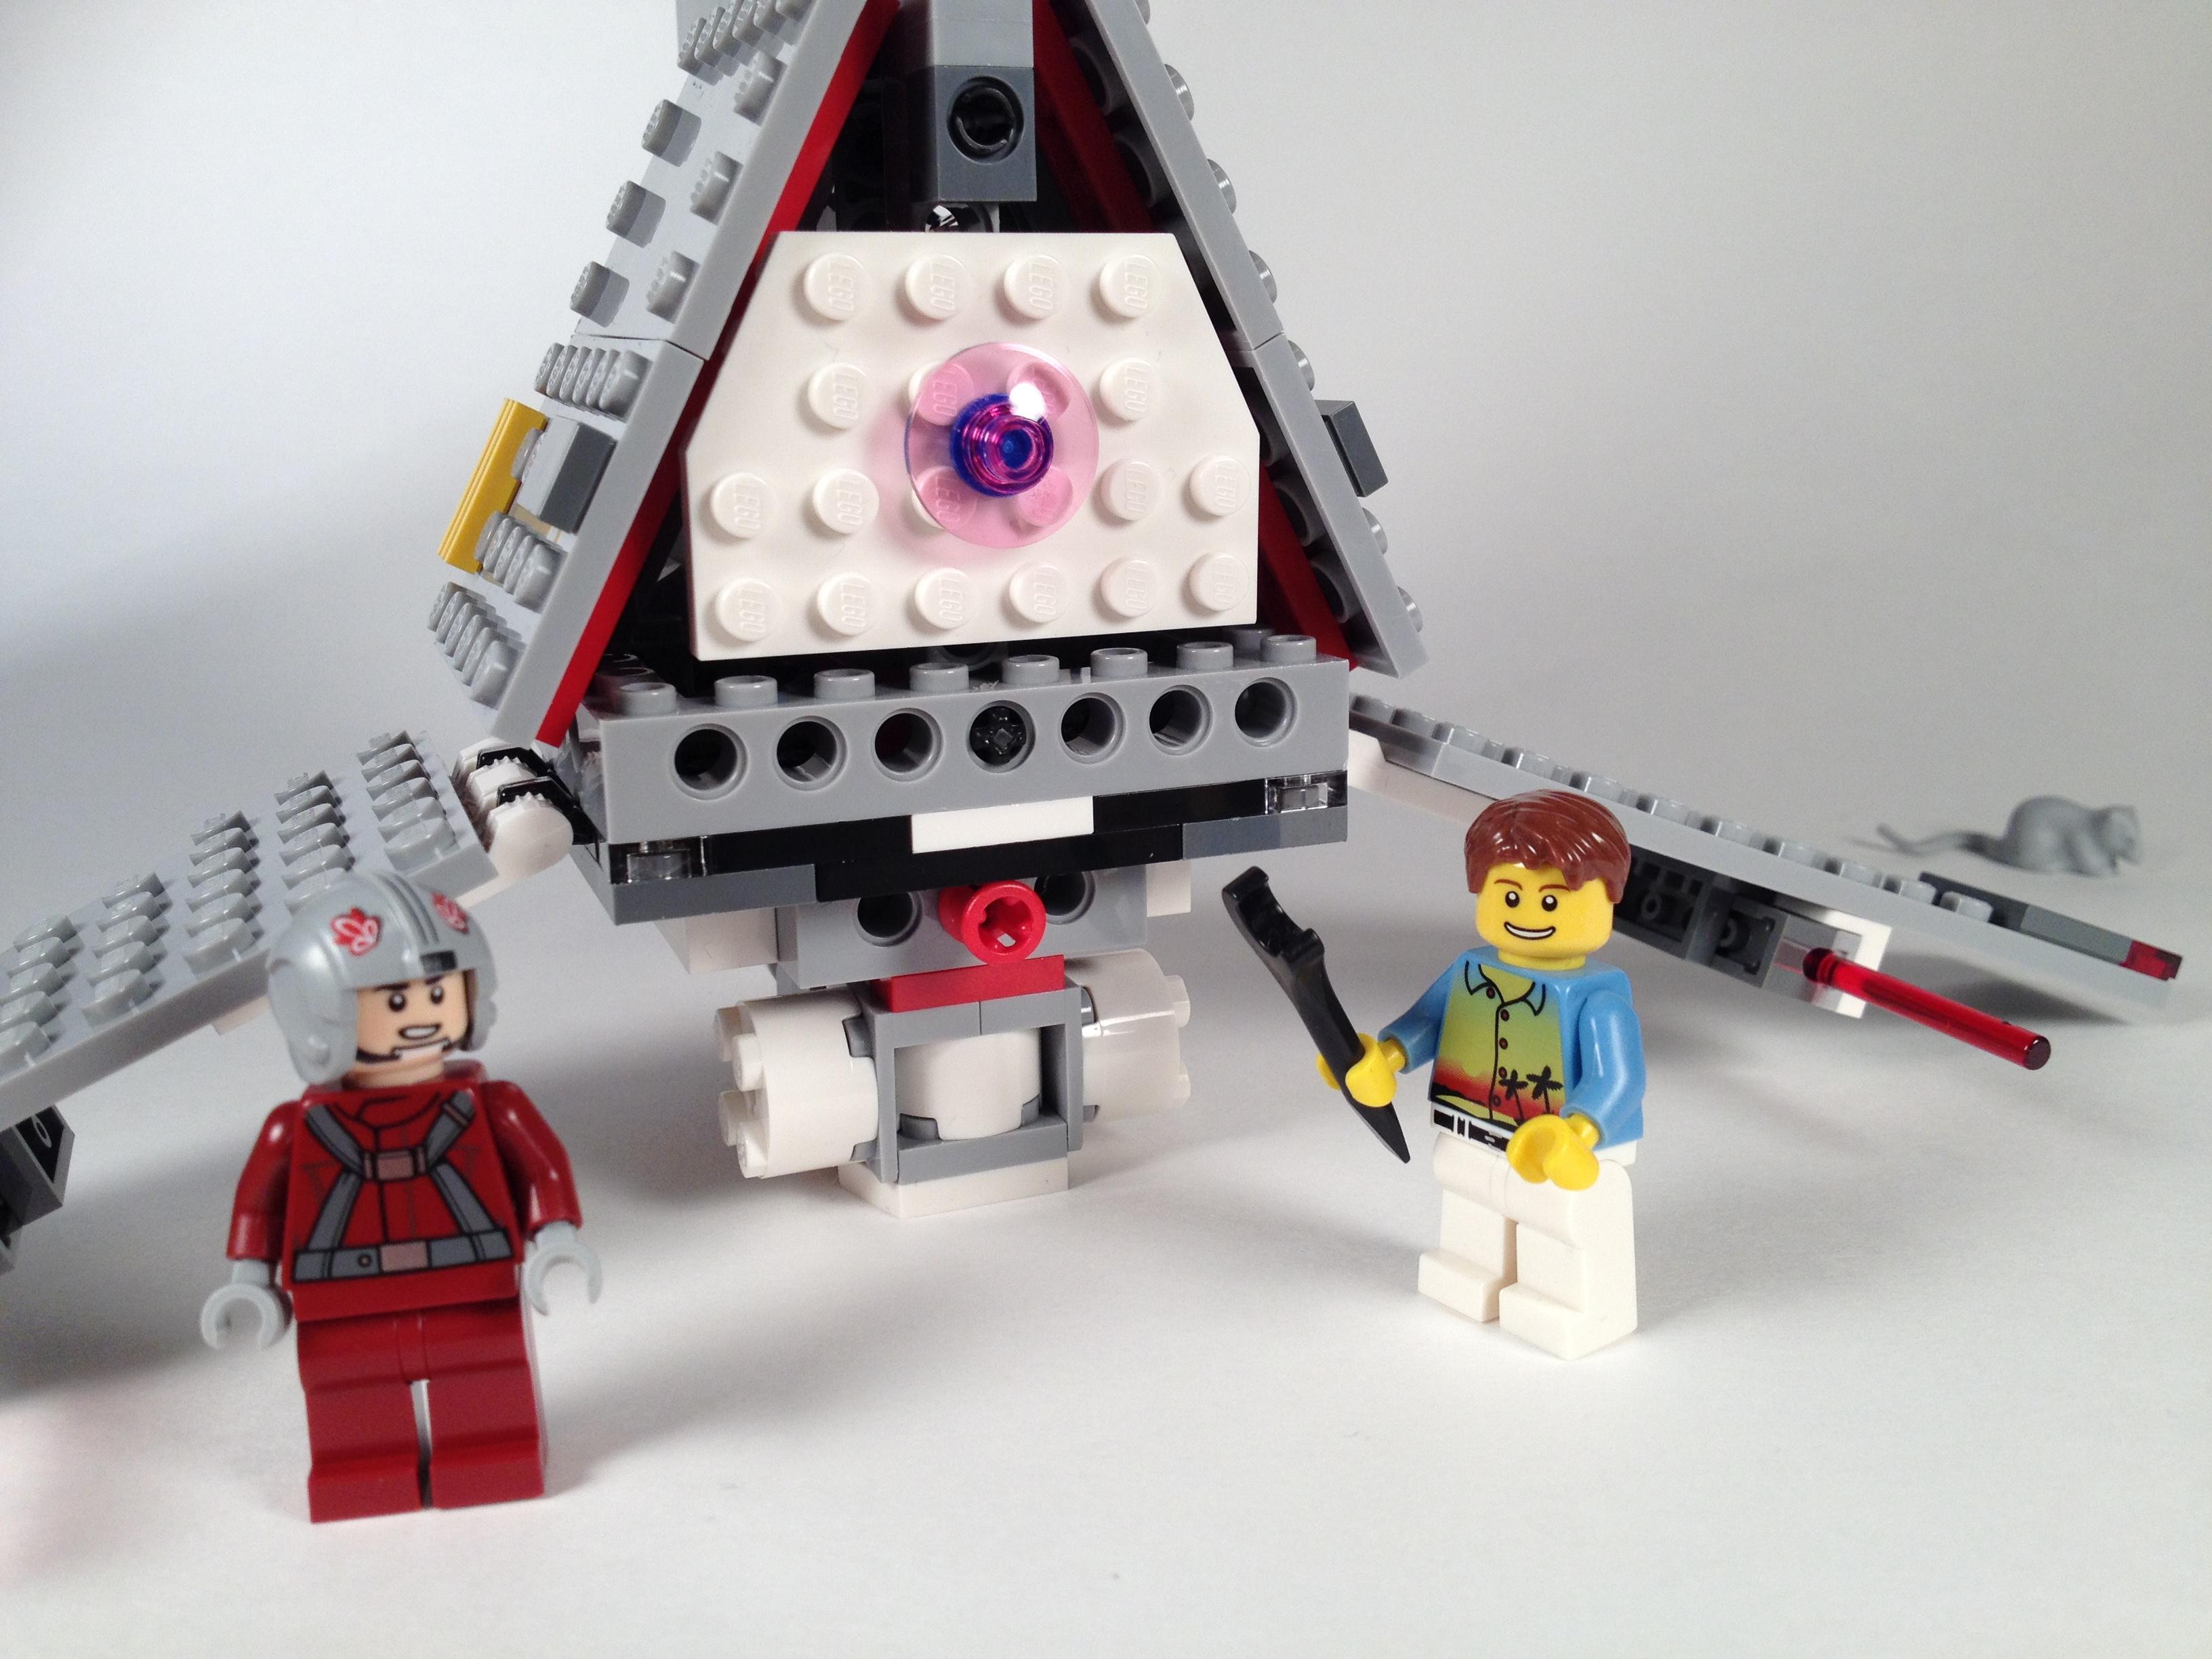 NEW LEGO Star Wars 75081 T-16 Skyhopper Tatooine Set *NO MINIFIGURES*